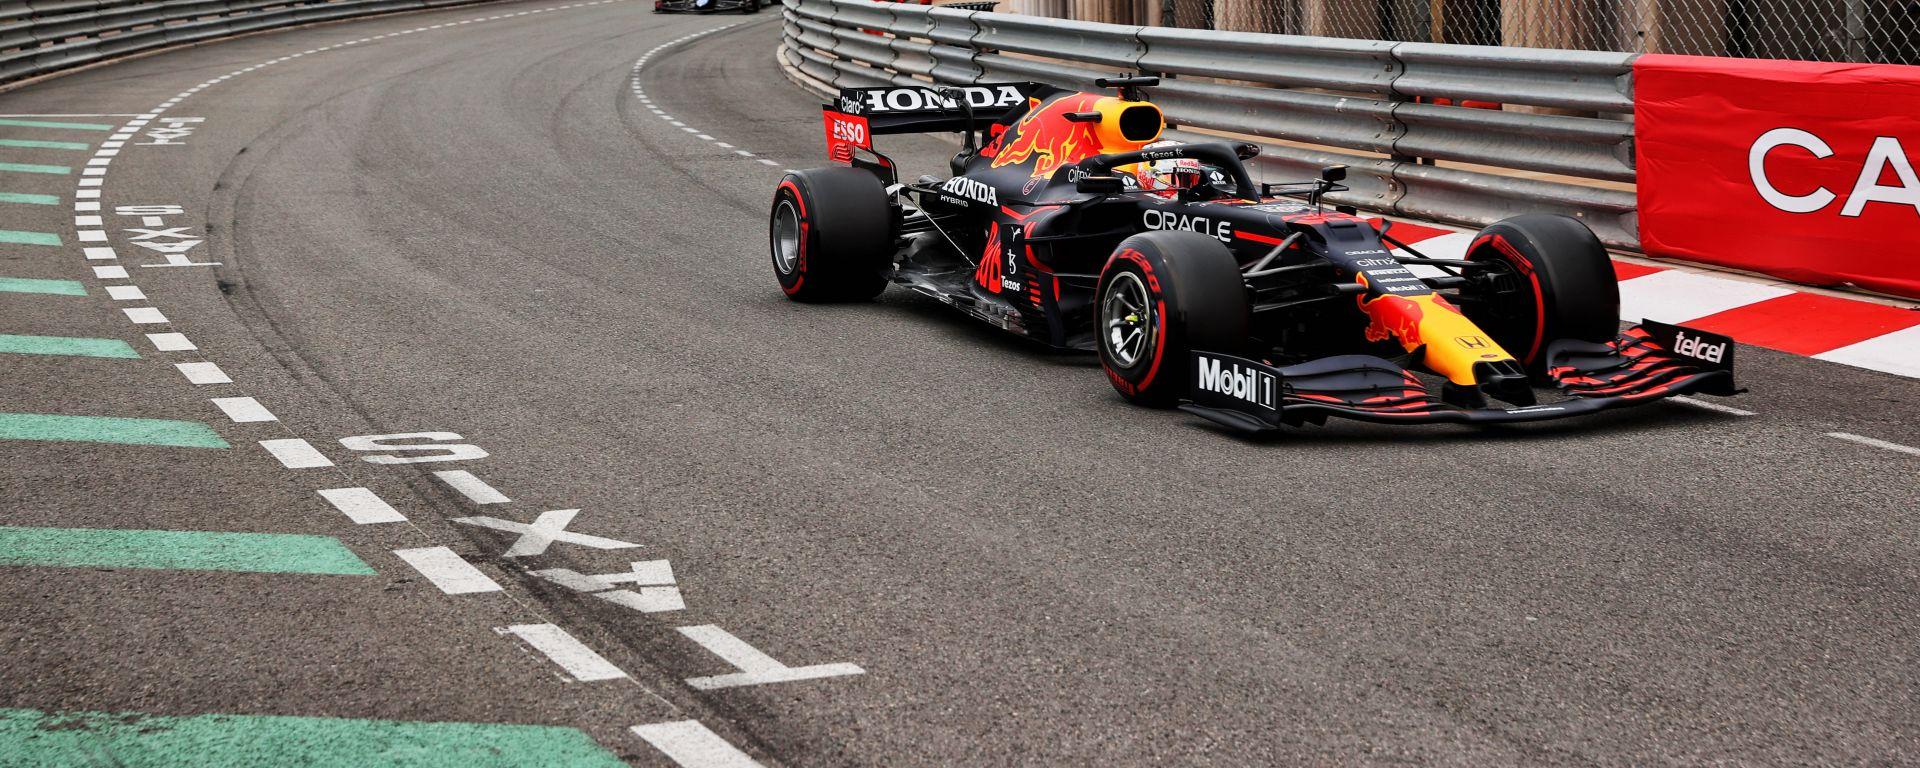 F1 GP Monaco 2021, Monte Carlo: Max Verstappen (Red Bull Racing)